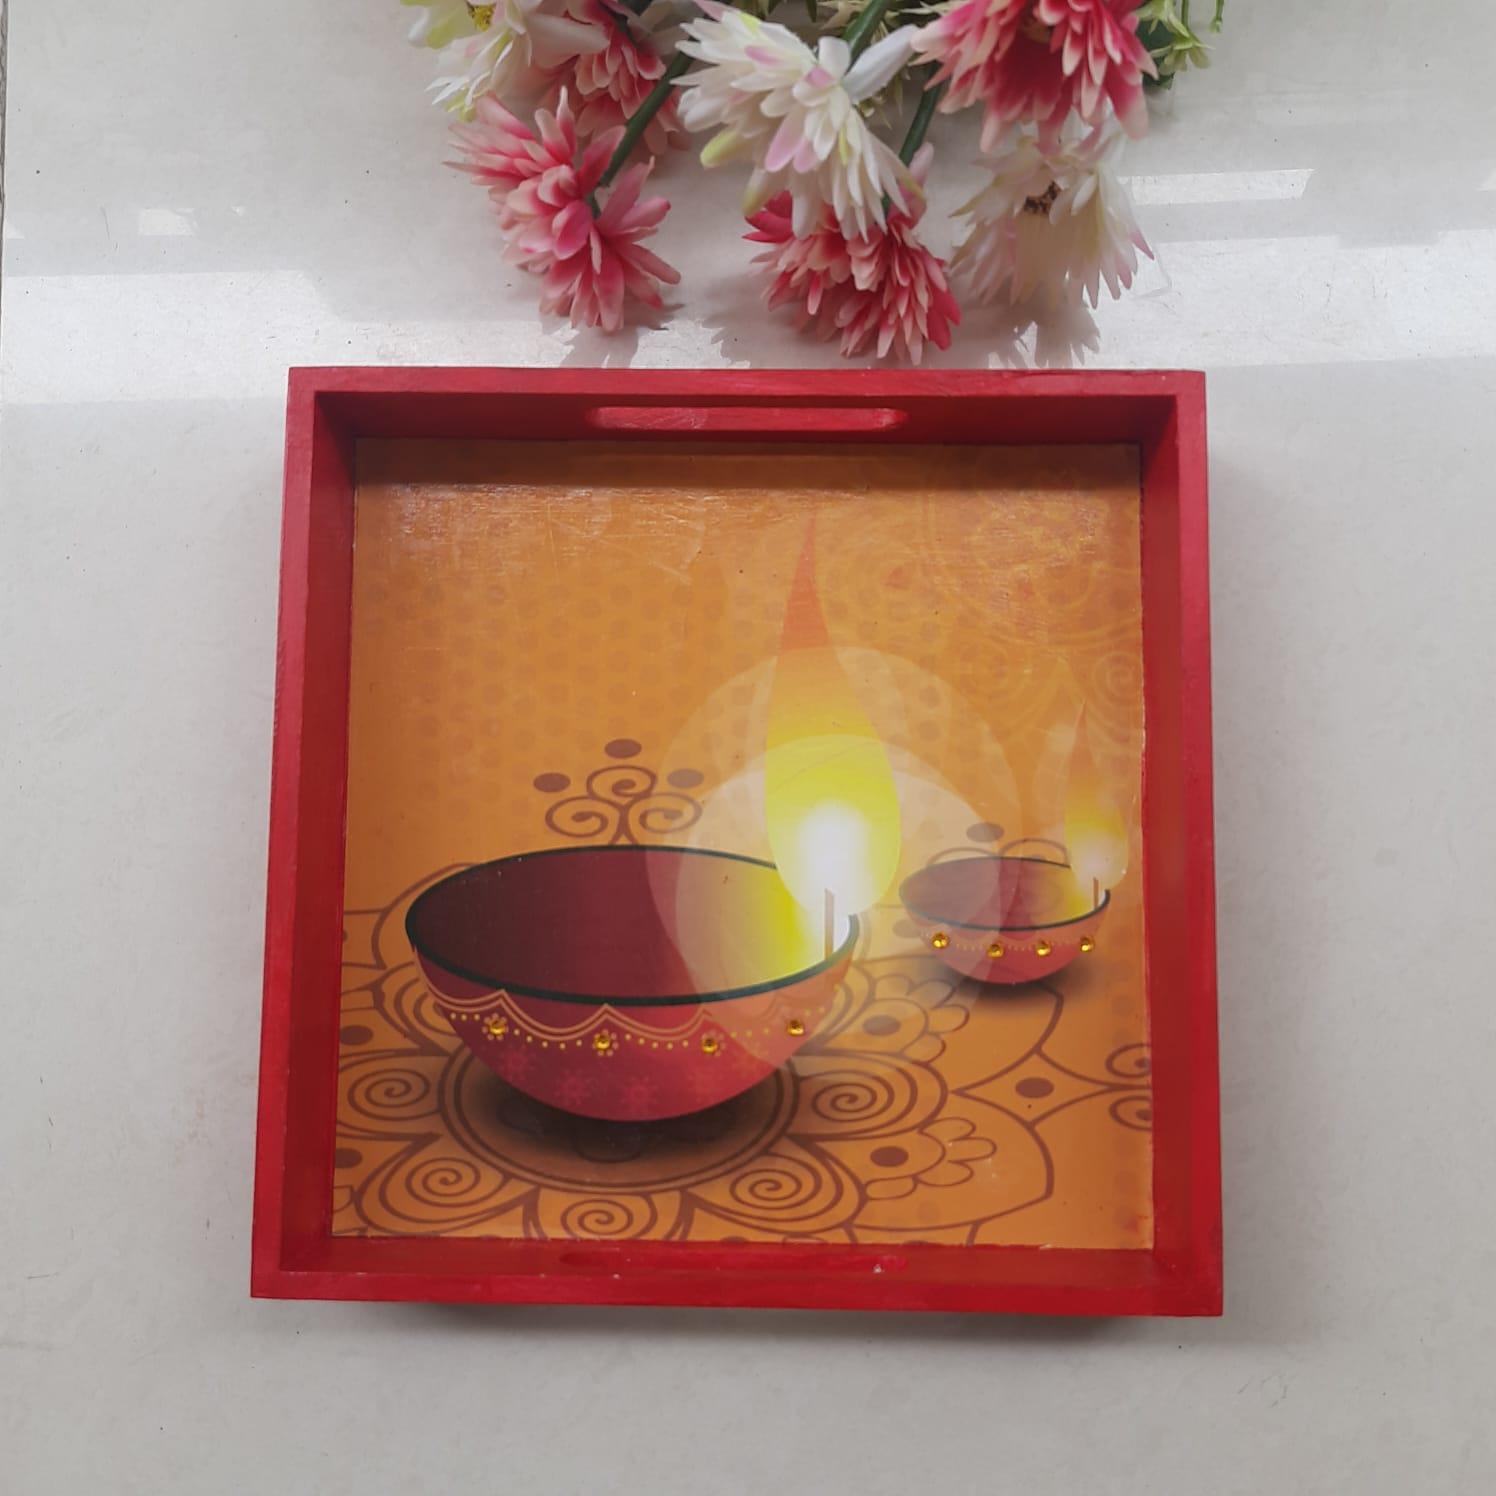 Diwali Hamper with Decoupage Tray, Tealights, Greeting Card, Chikkis Slider Thumbnail 2/4